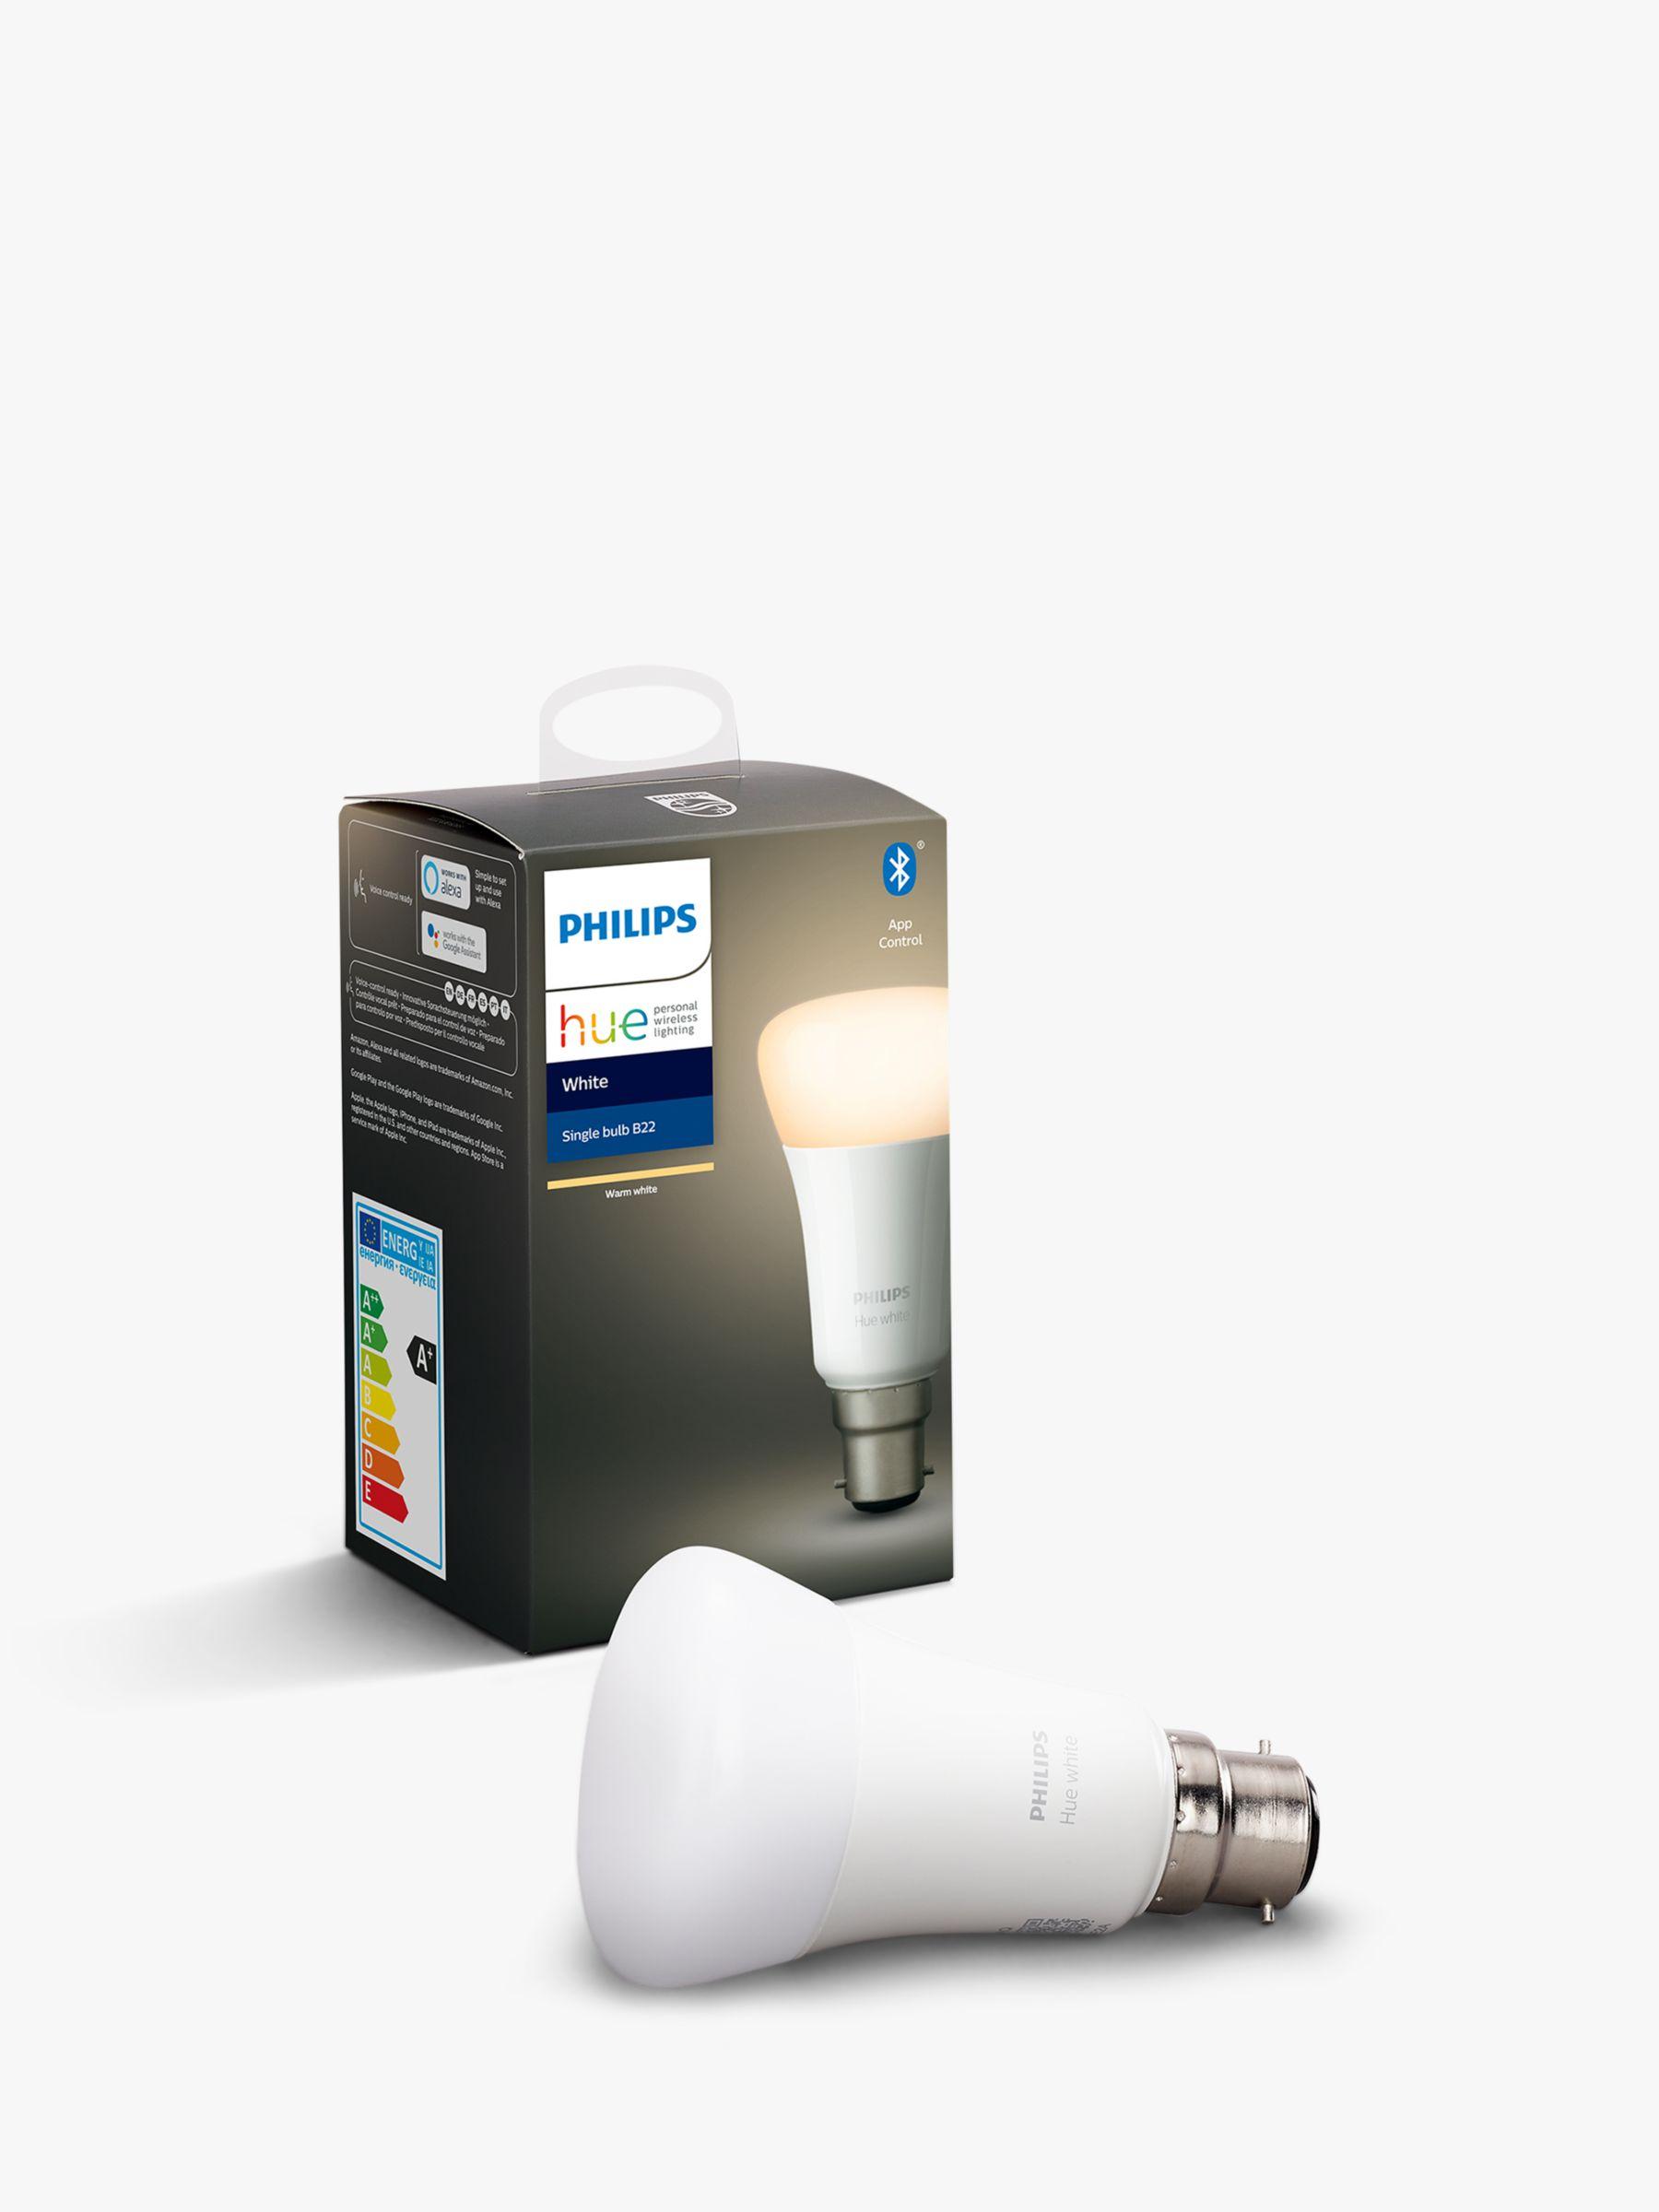 Philips Philips Hue White Wireless Lighting LED Light Bulb with Bluetooth, 9W A60 B22 Bayonet Cap Bulb, Single